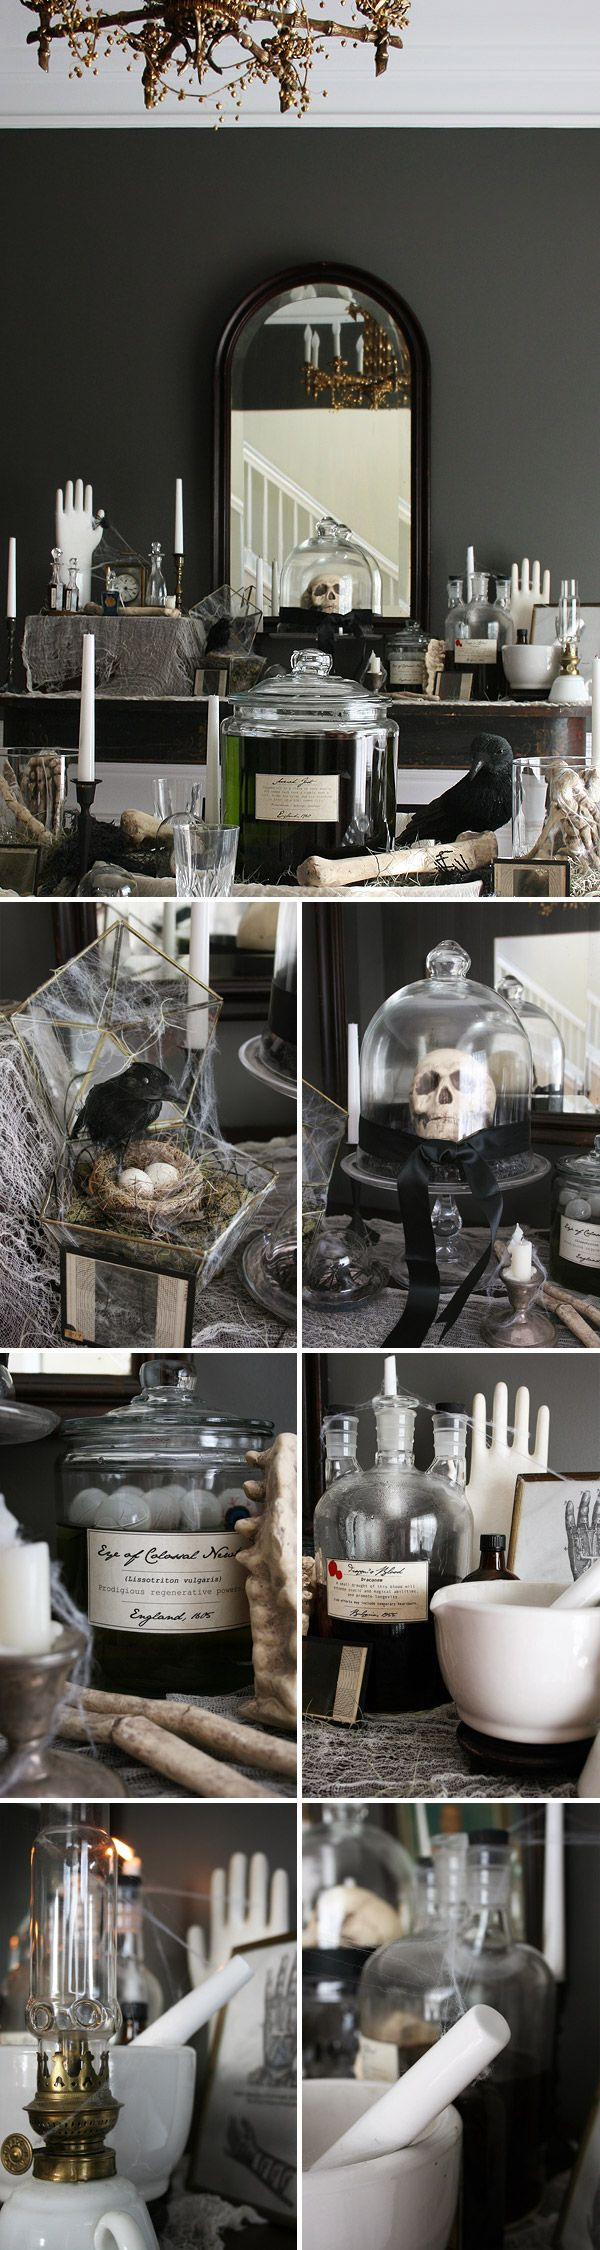 Mad Scientist Halloween Party   Spooky Elegant Halloween Decor ...